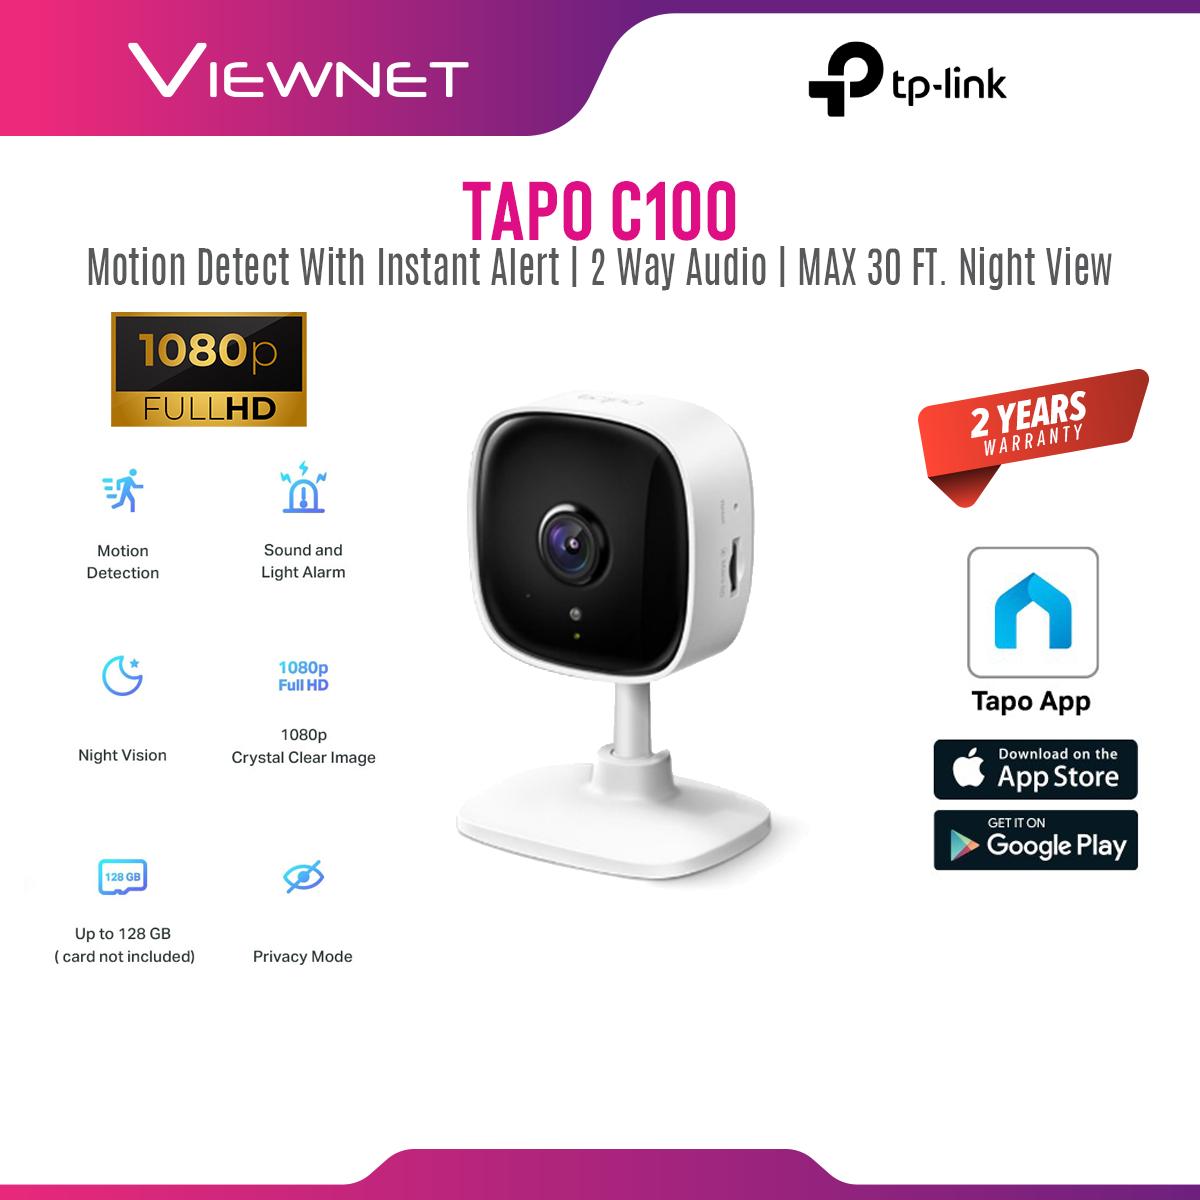 TP-Link Tapo C100 A.K.A TC60 1080P Full HD Wireless WiFi Smart Security Surveillance IP Camera